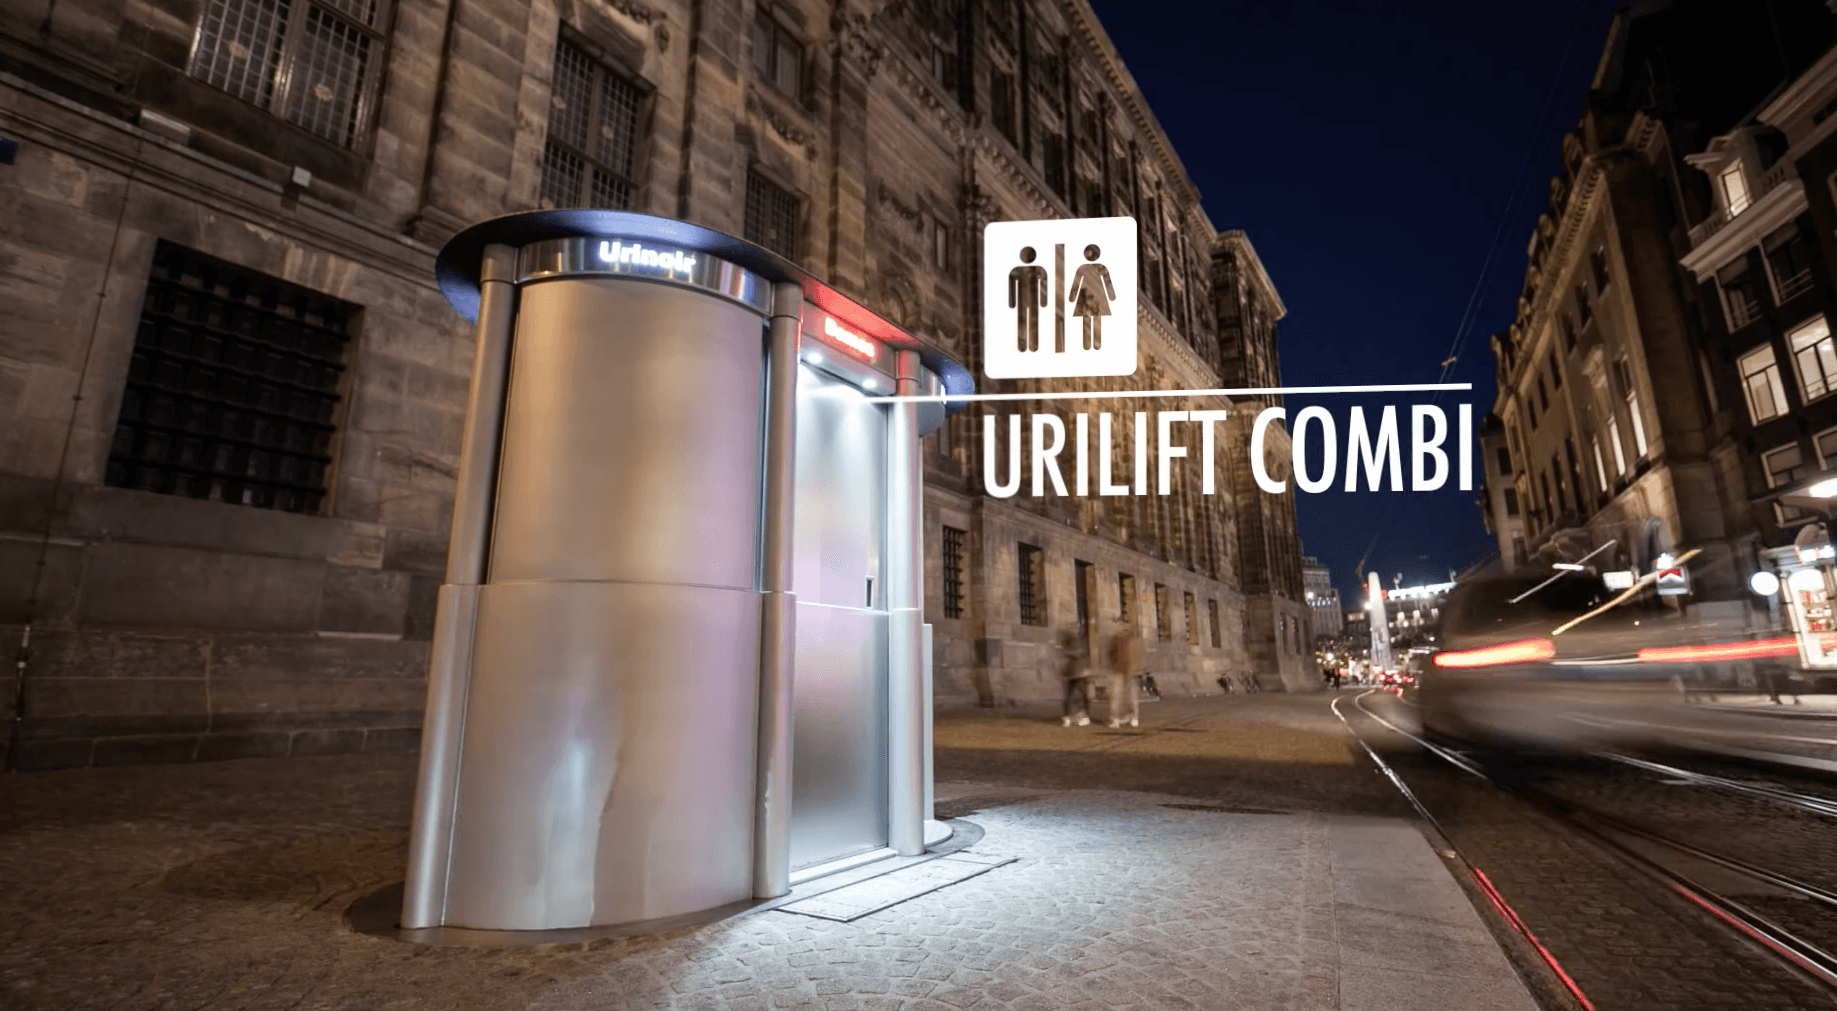 Urilift